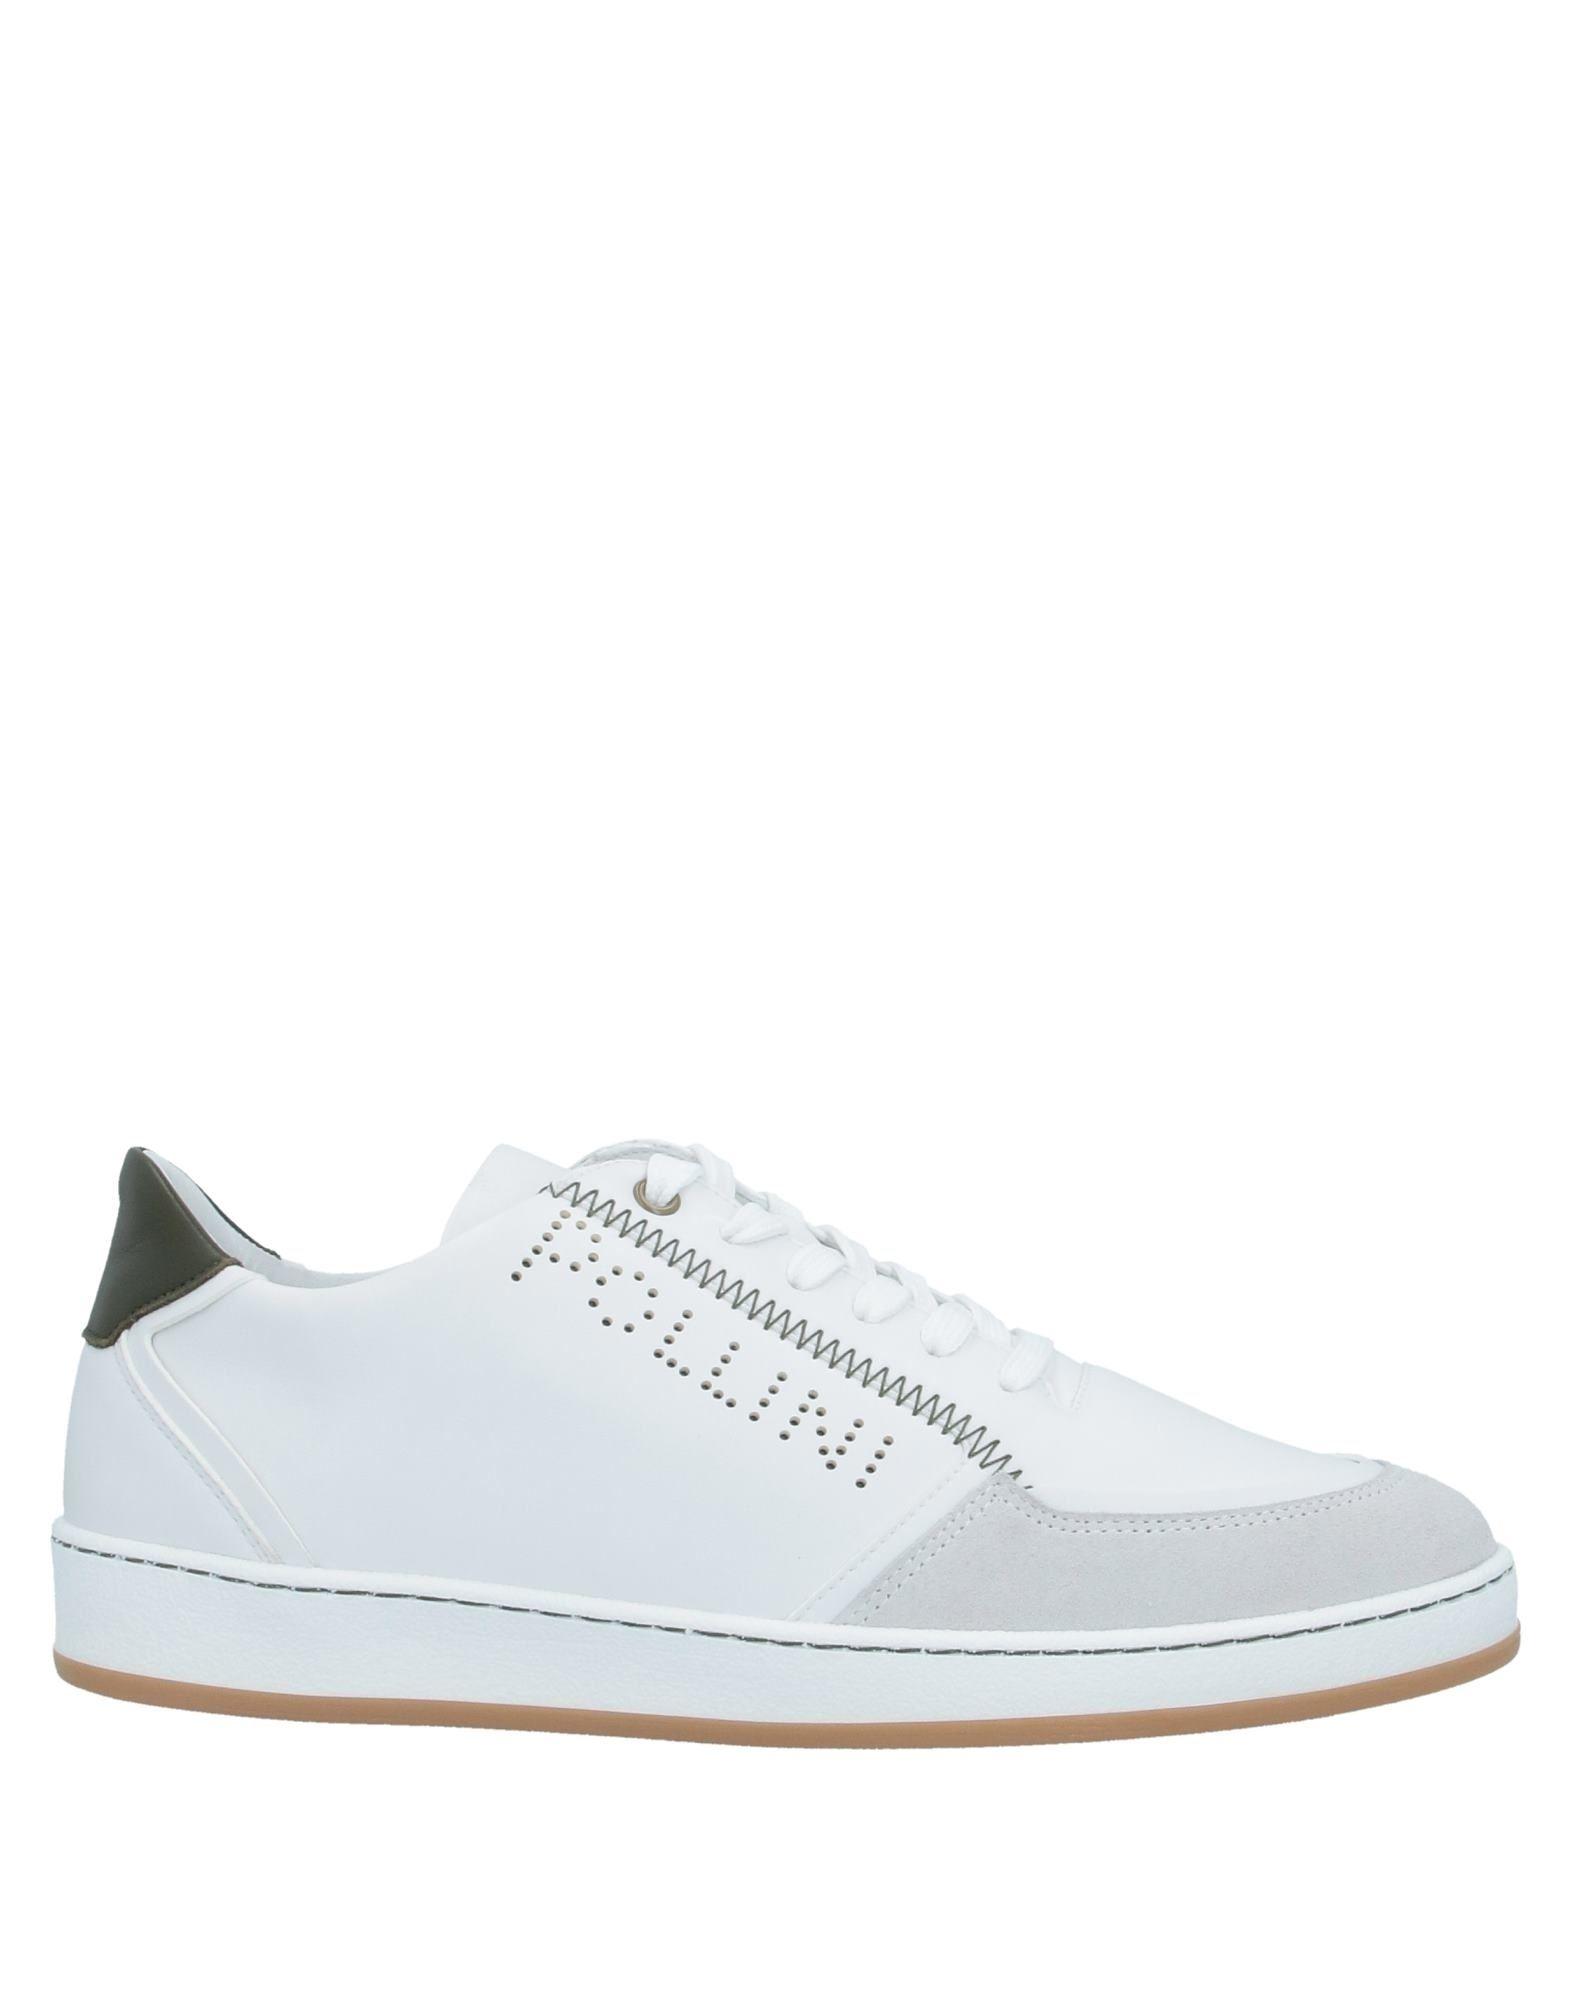 POLLINI Низкие кеды и кроссовки studio pollini низкие кеды и кроссовки